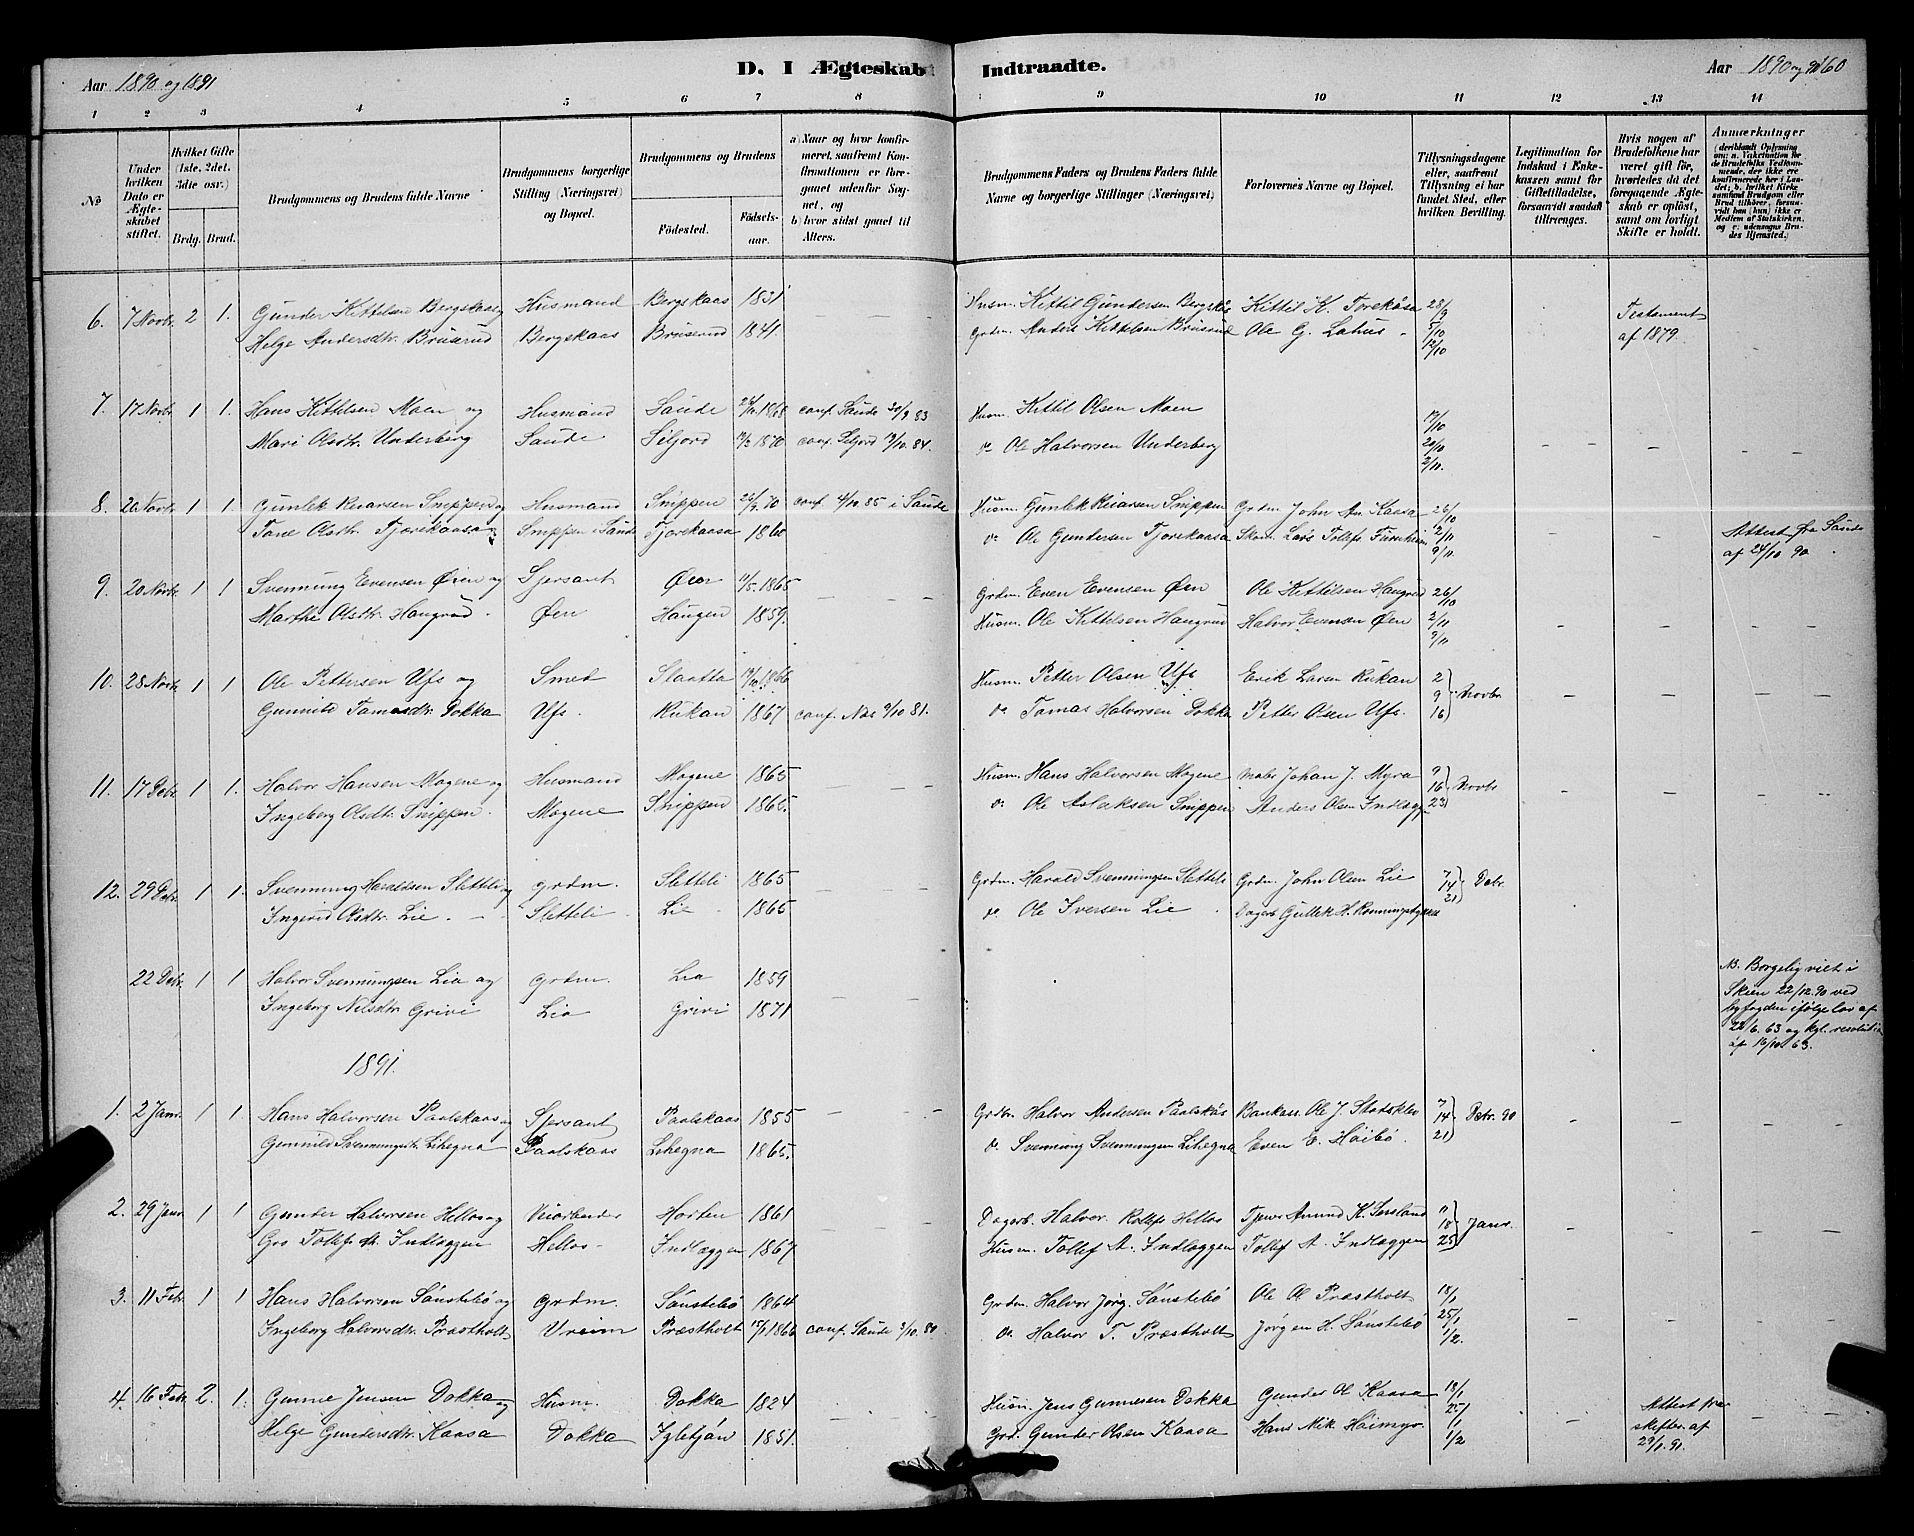 SAKO, Bø kirkebøker, G/Ga/L0005: Klokkerbok nr. 5, 1883-1897, s. 160